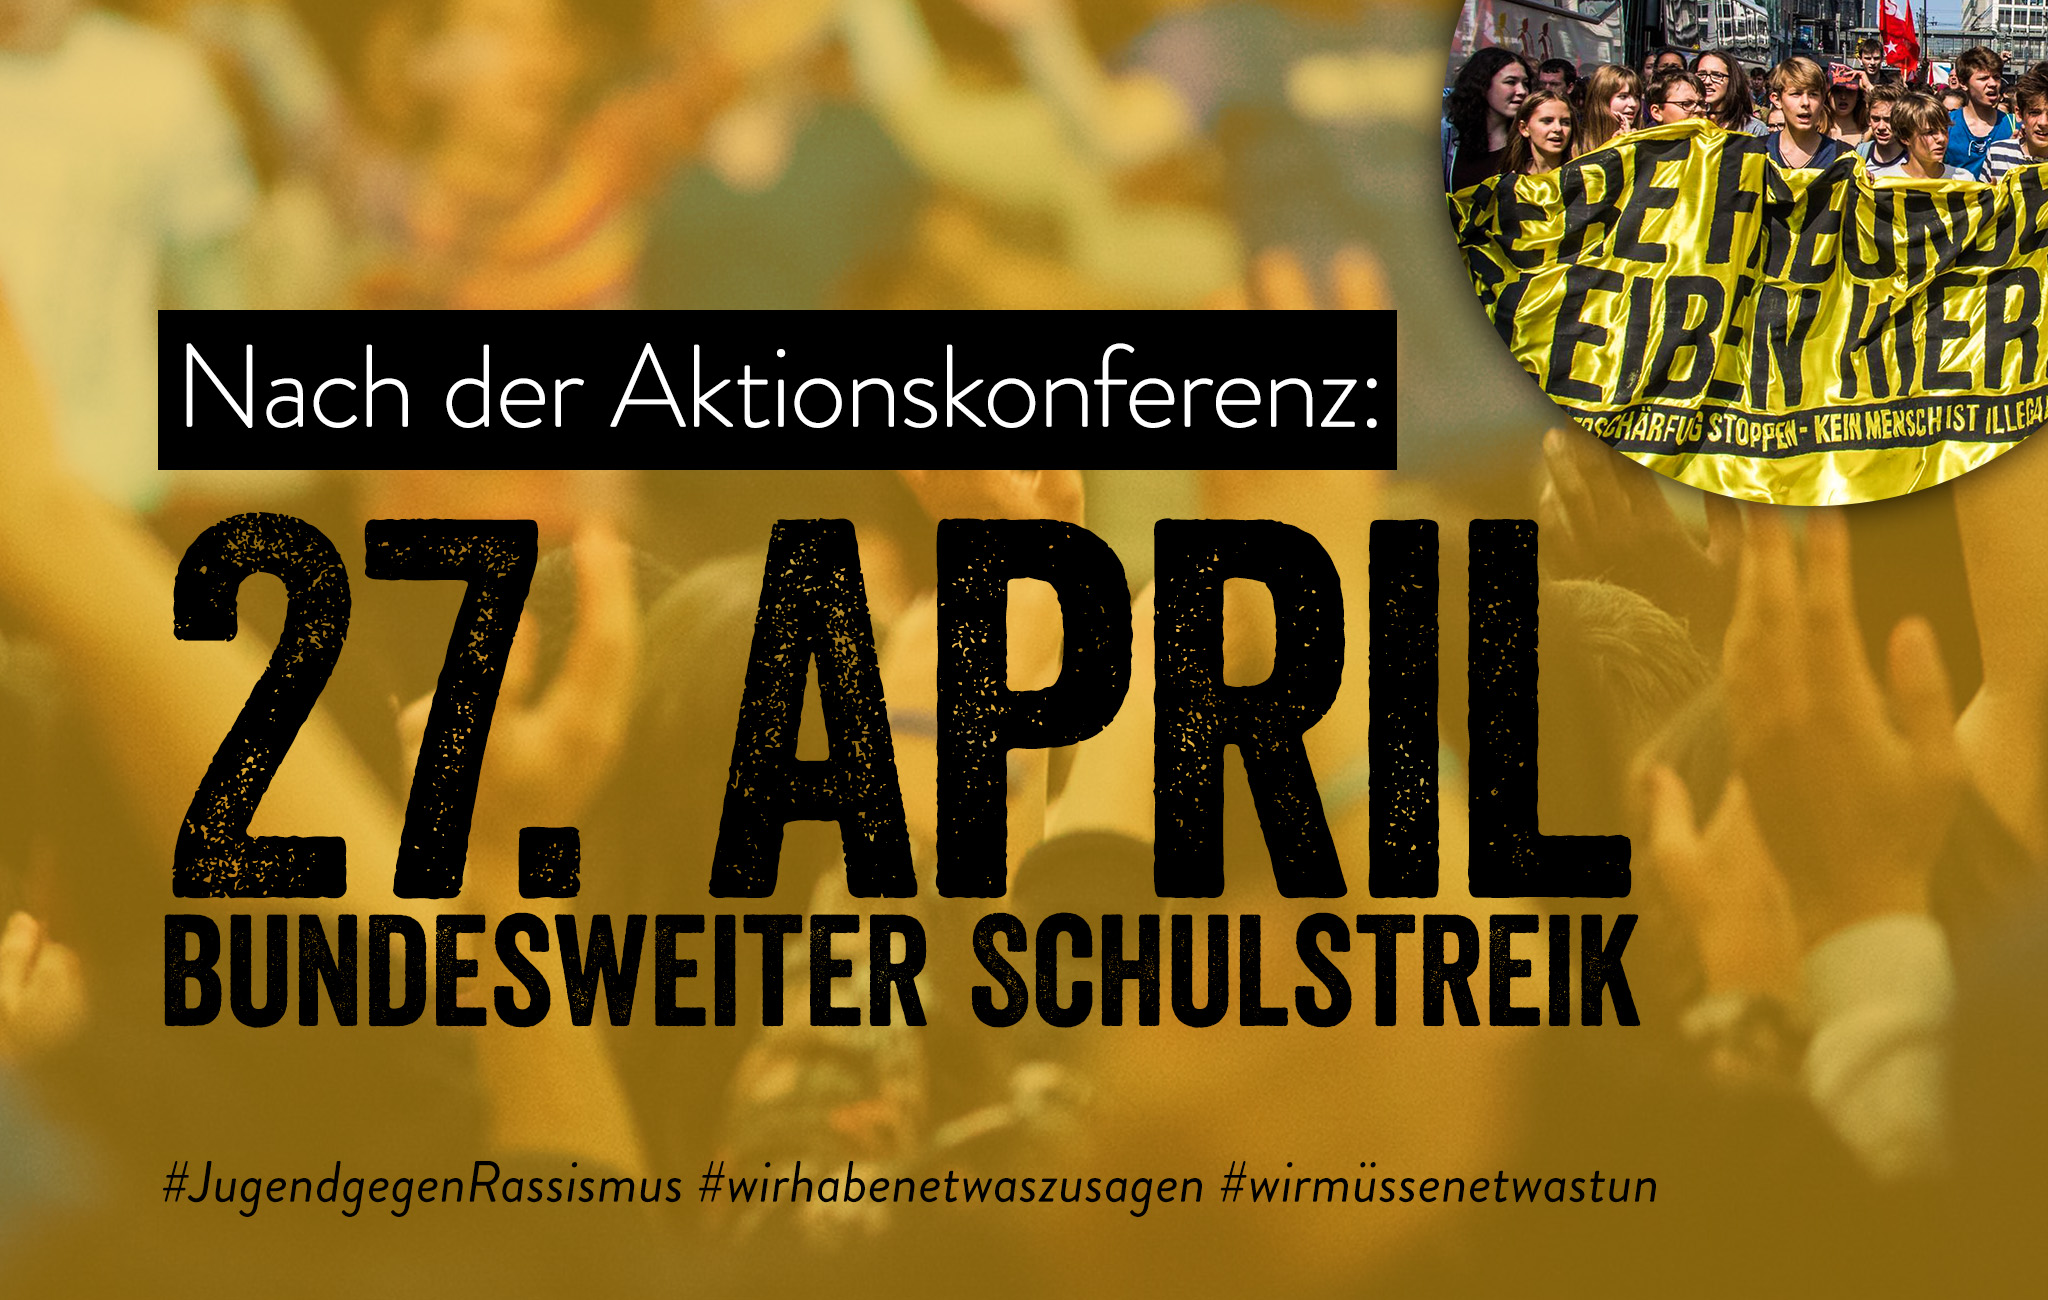 Schulstreik 27.April